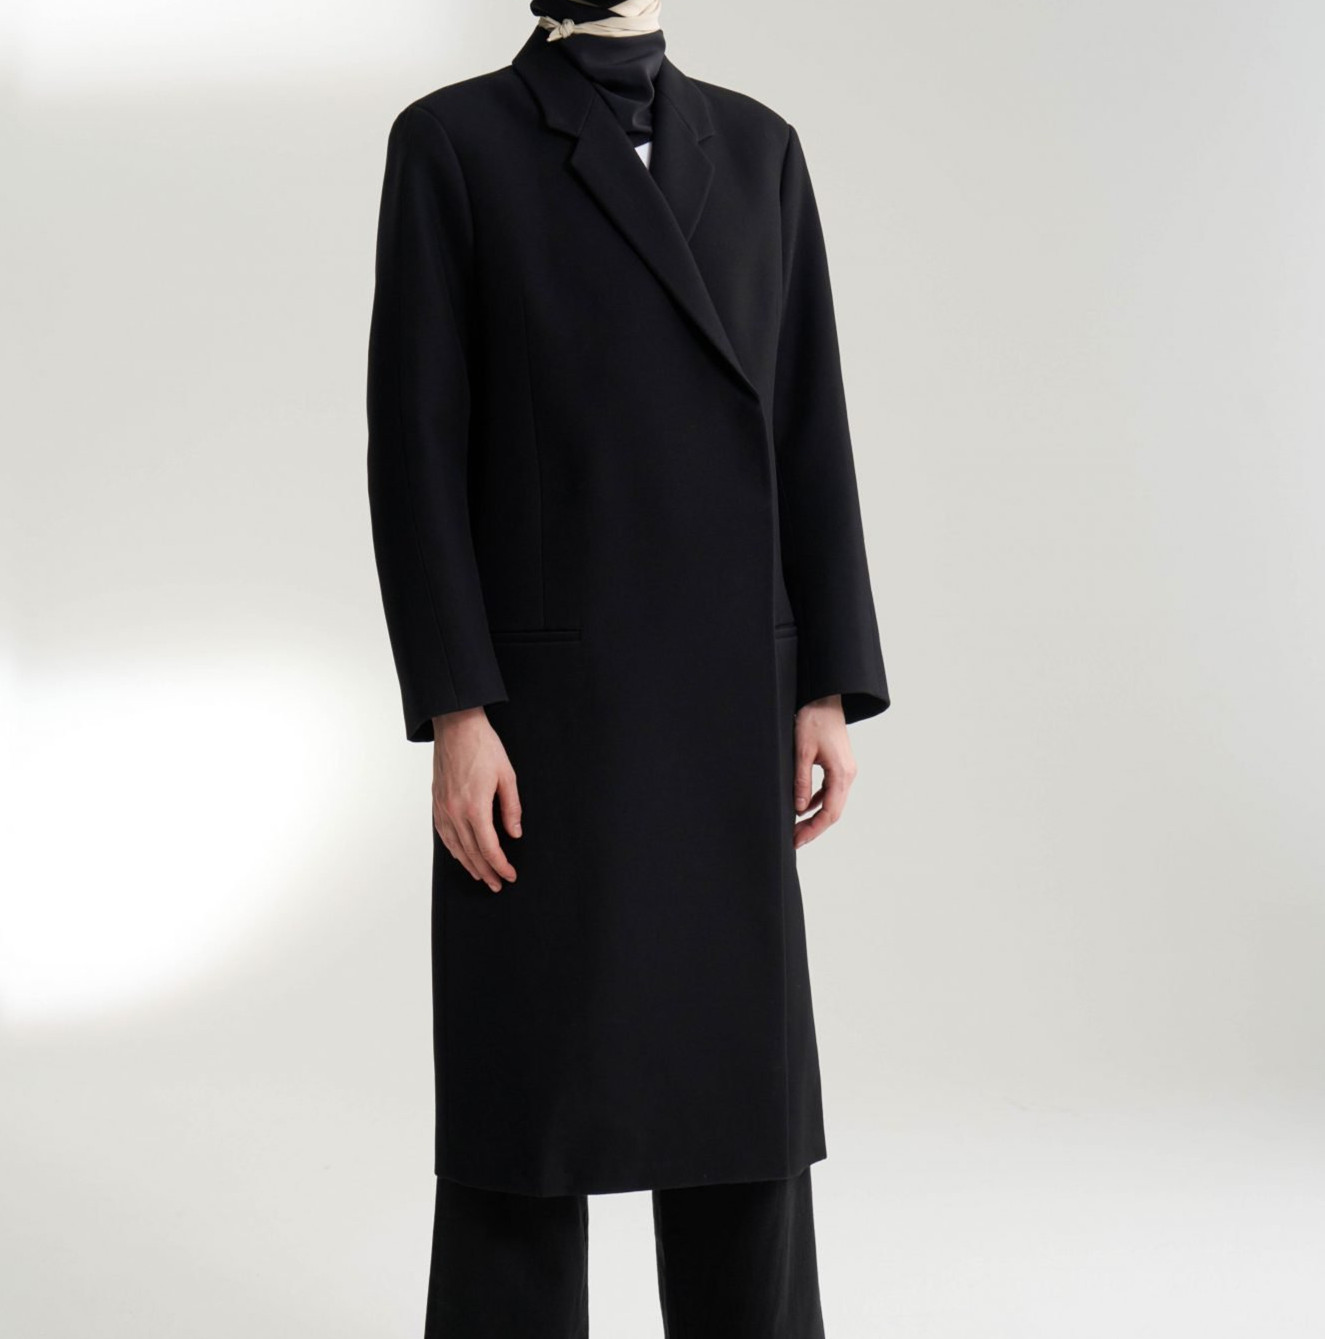 Women Jacket 2019 Autumn Urban Casual Women's Woven Polyester Large Size Jacket